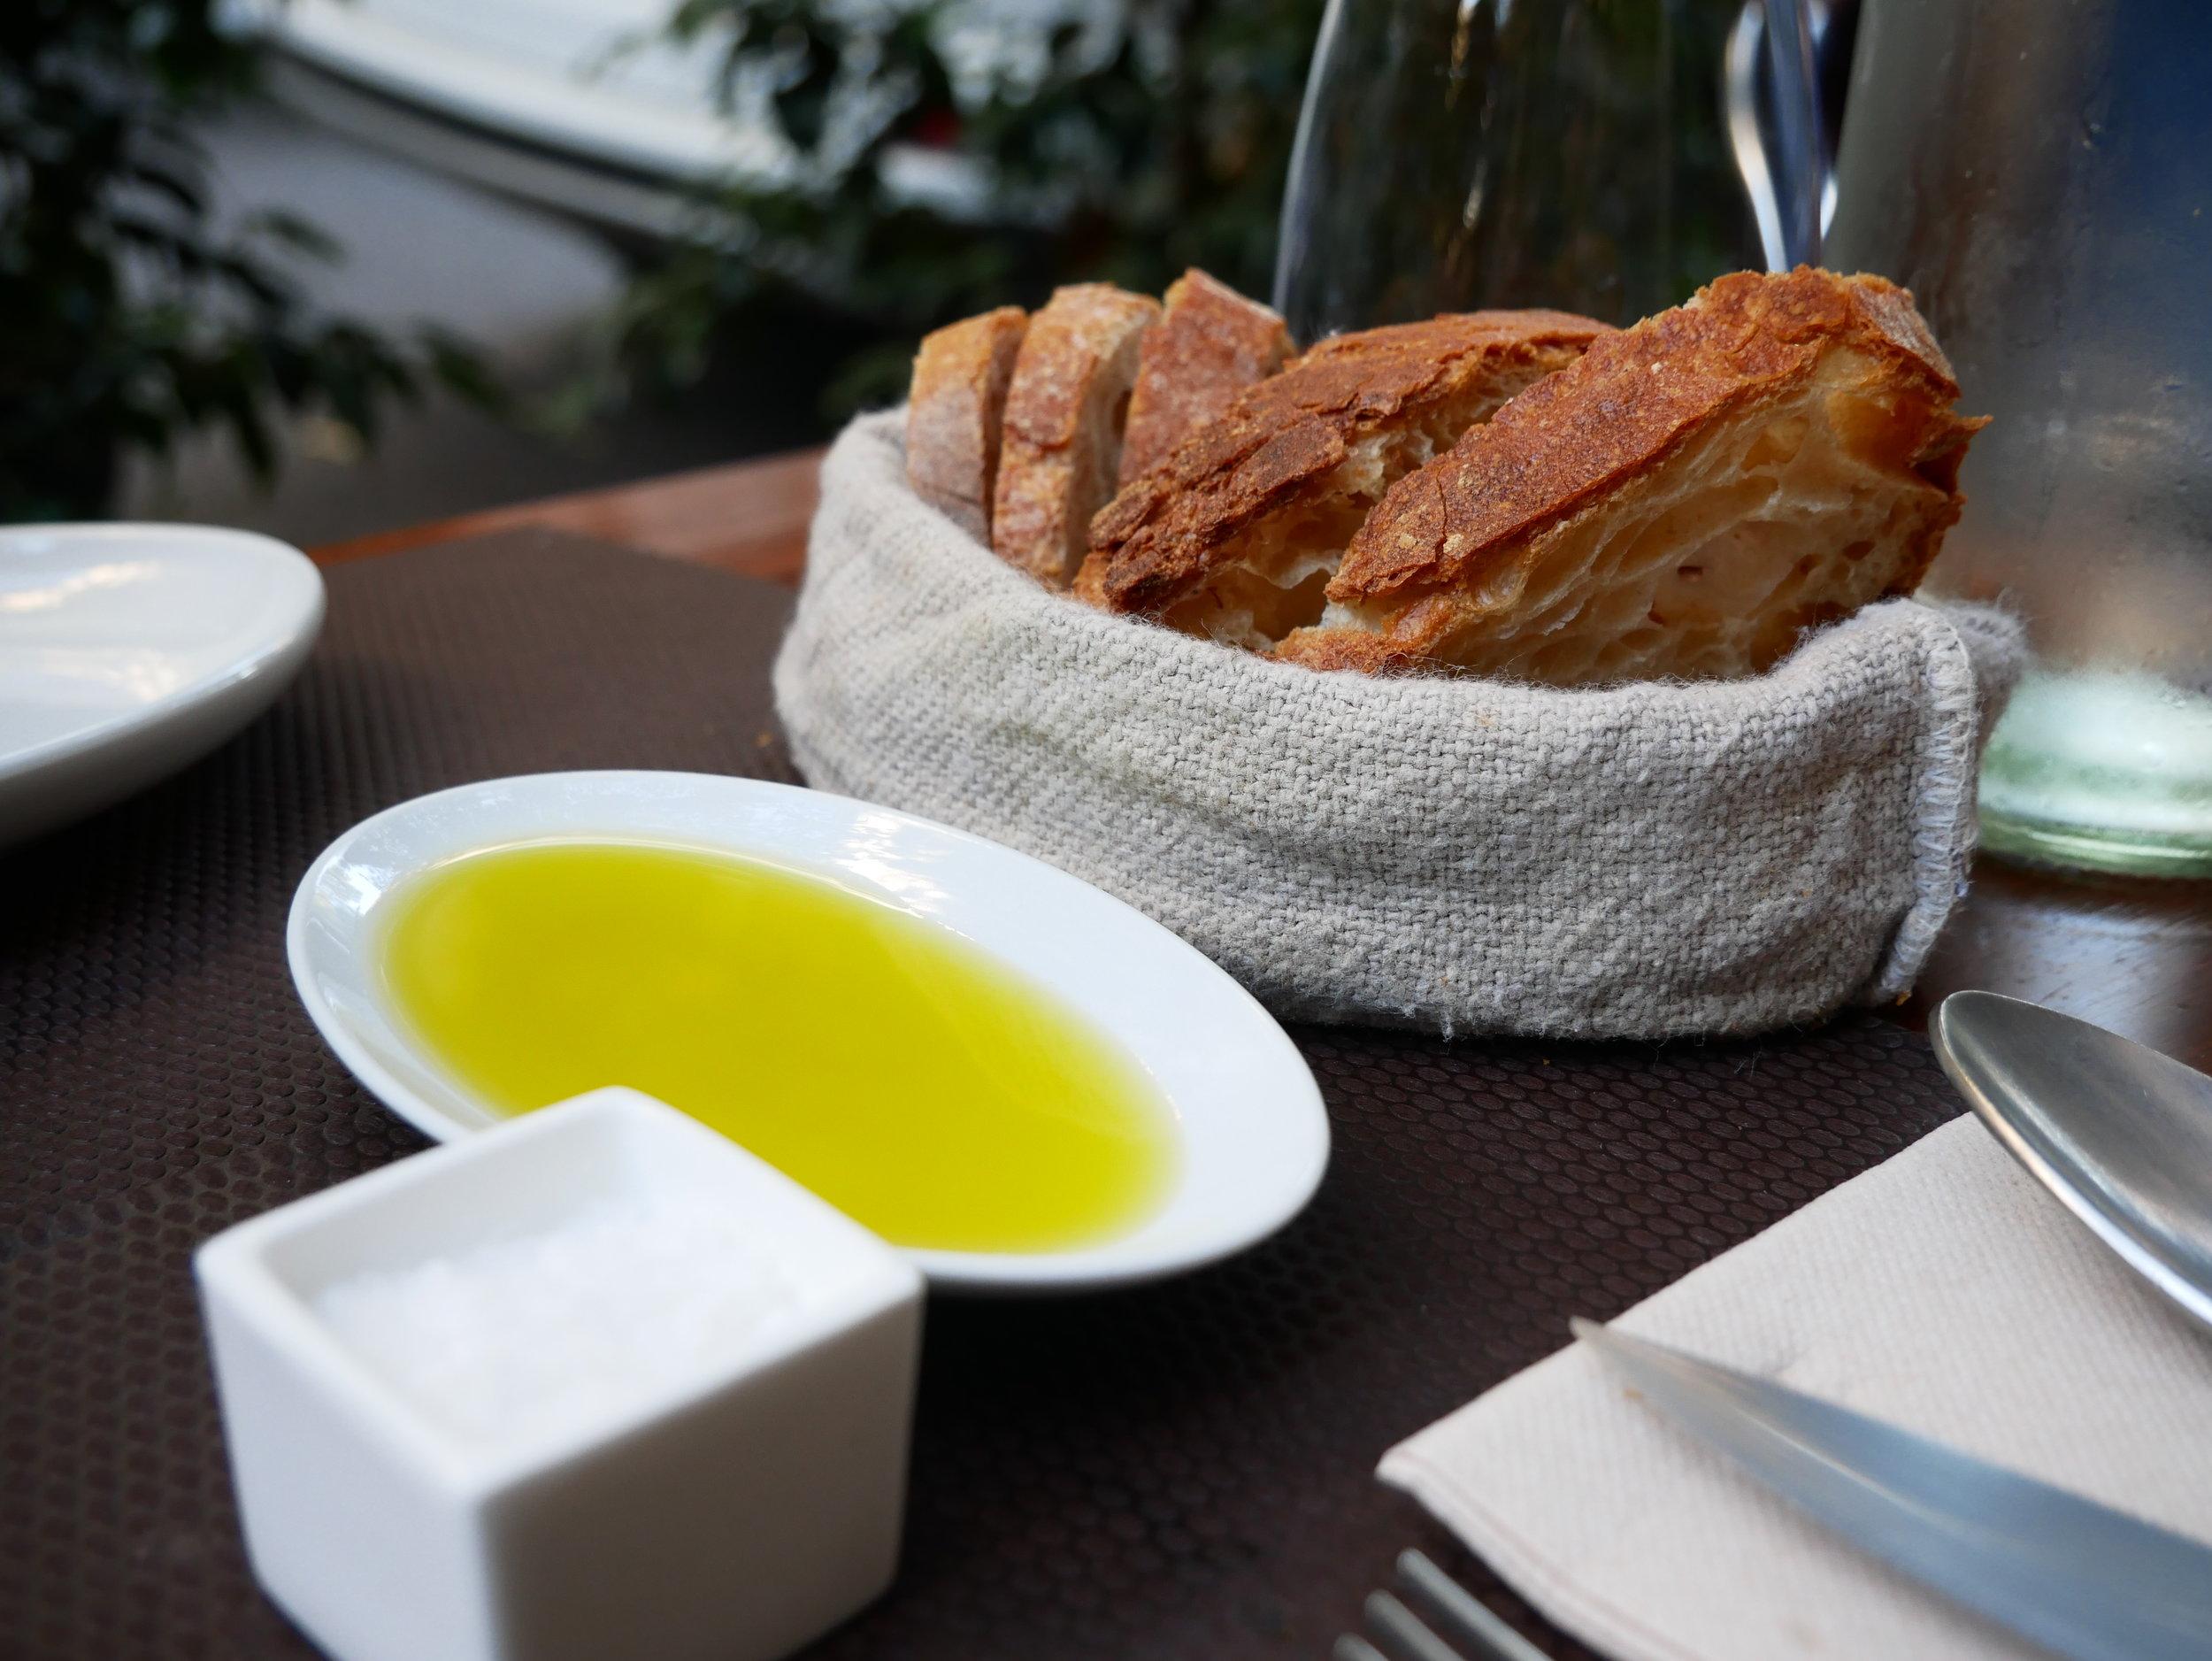 Teòric bread